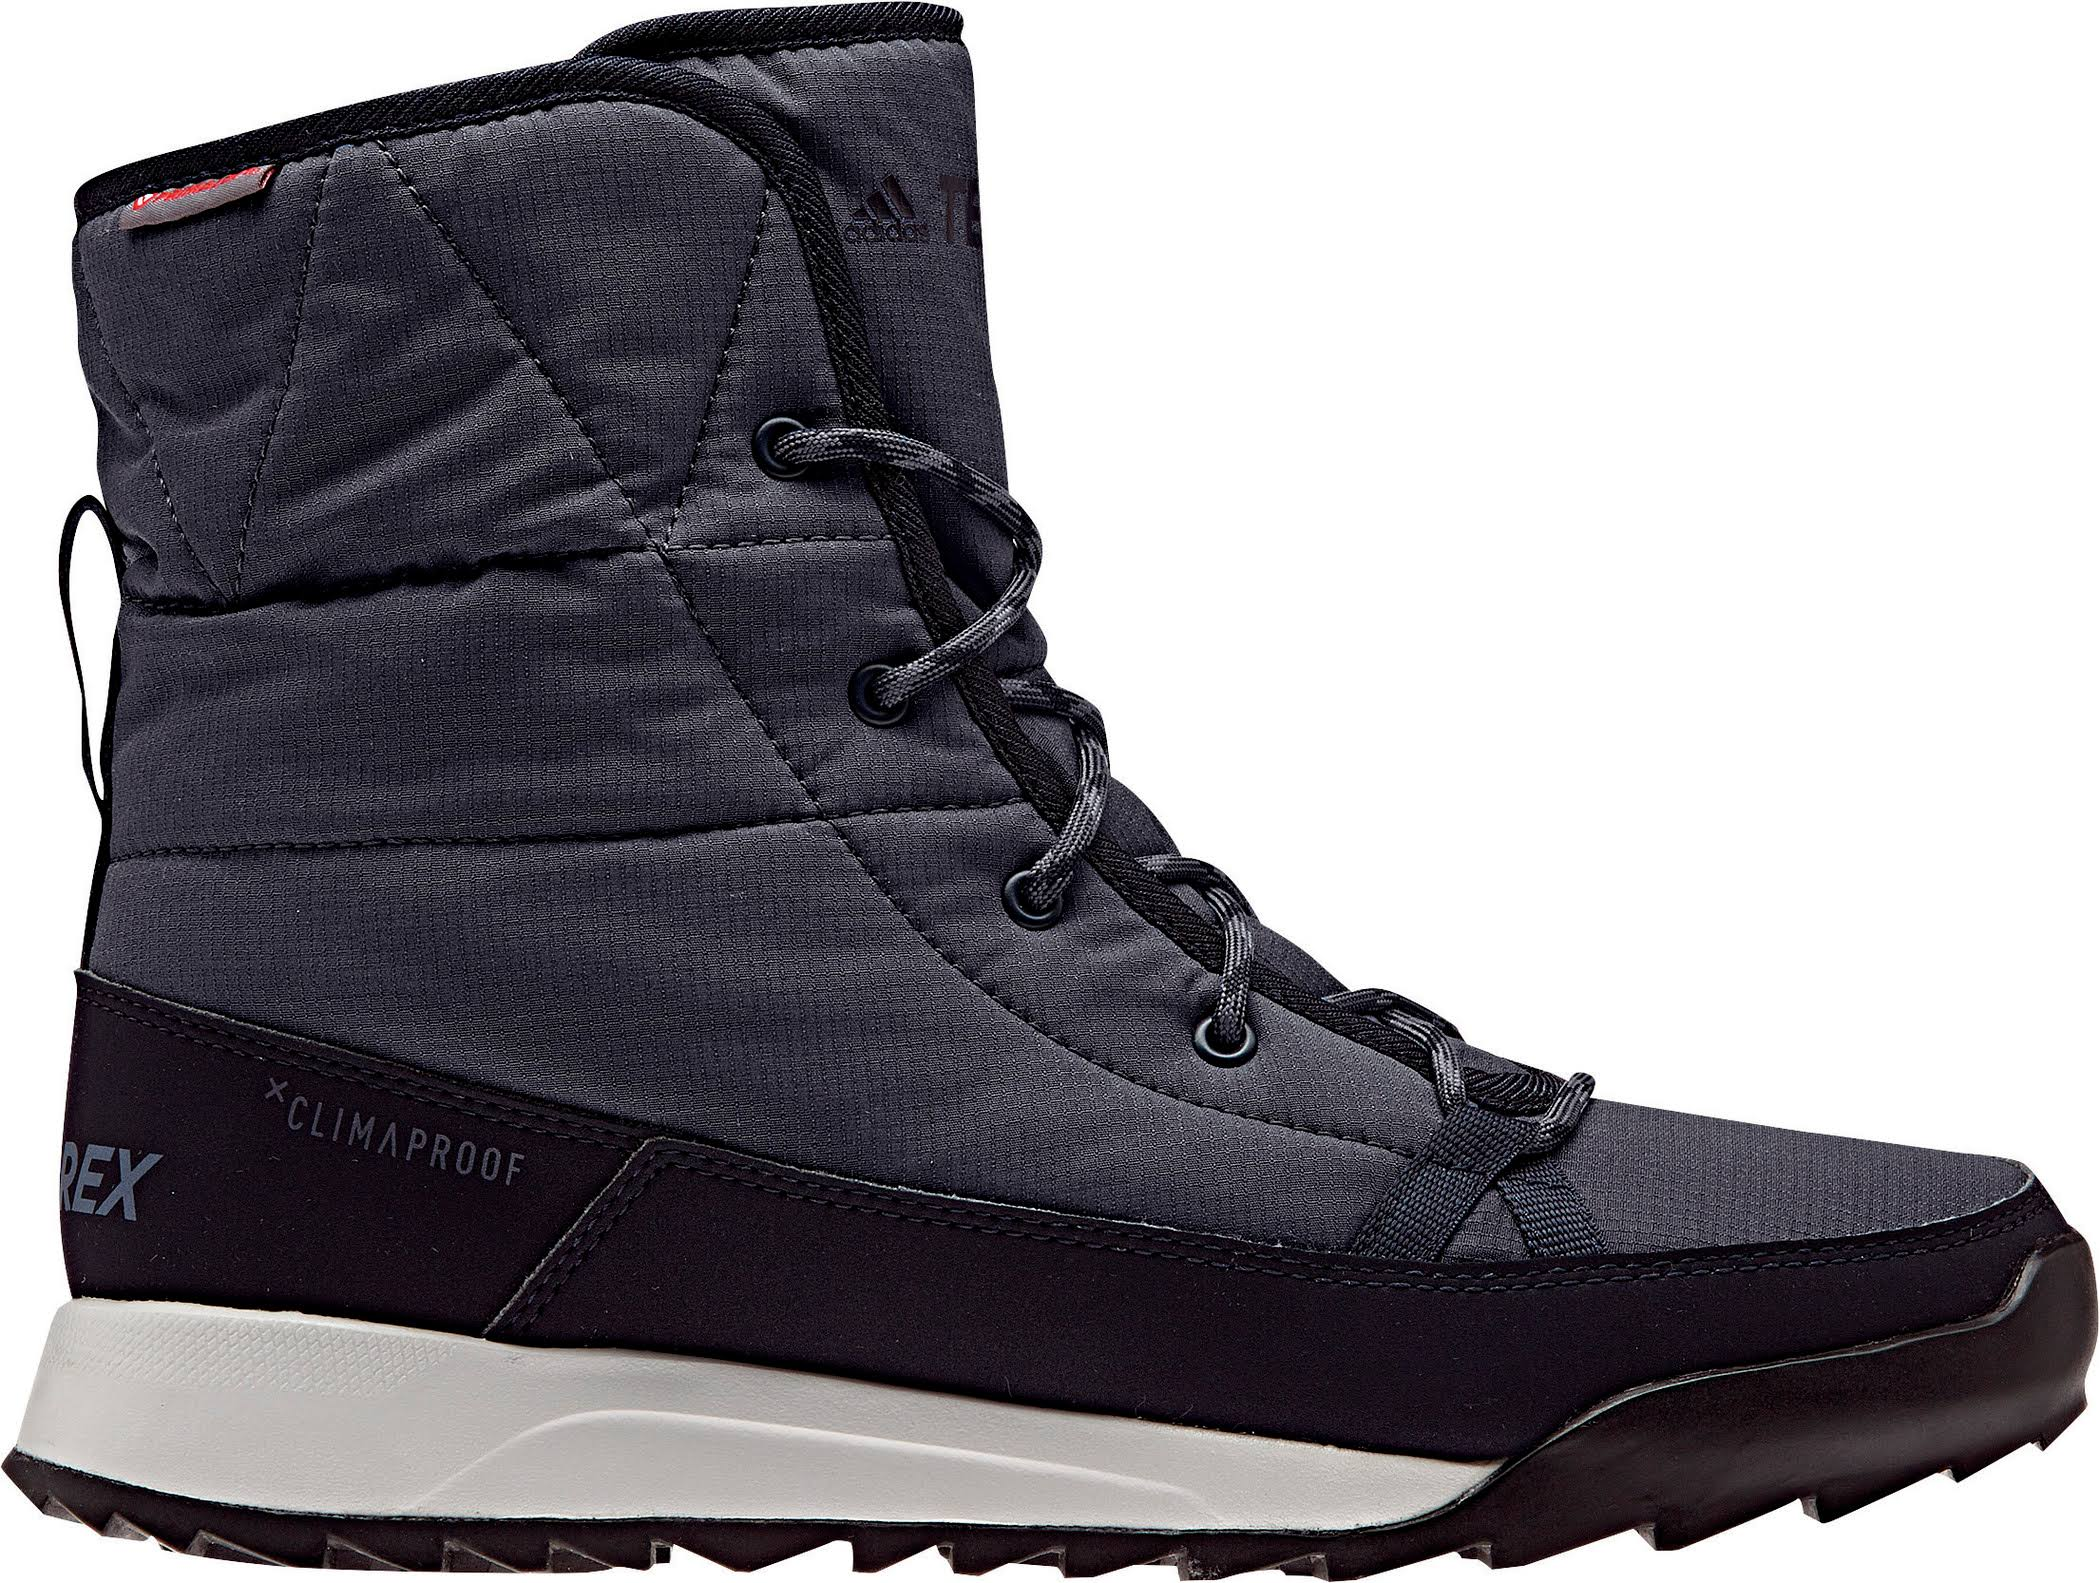 Climaproof Terrex Buty Boots Adidas Choleah Padded Granatowy aUIwT